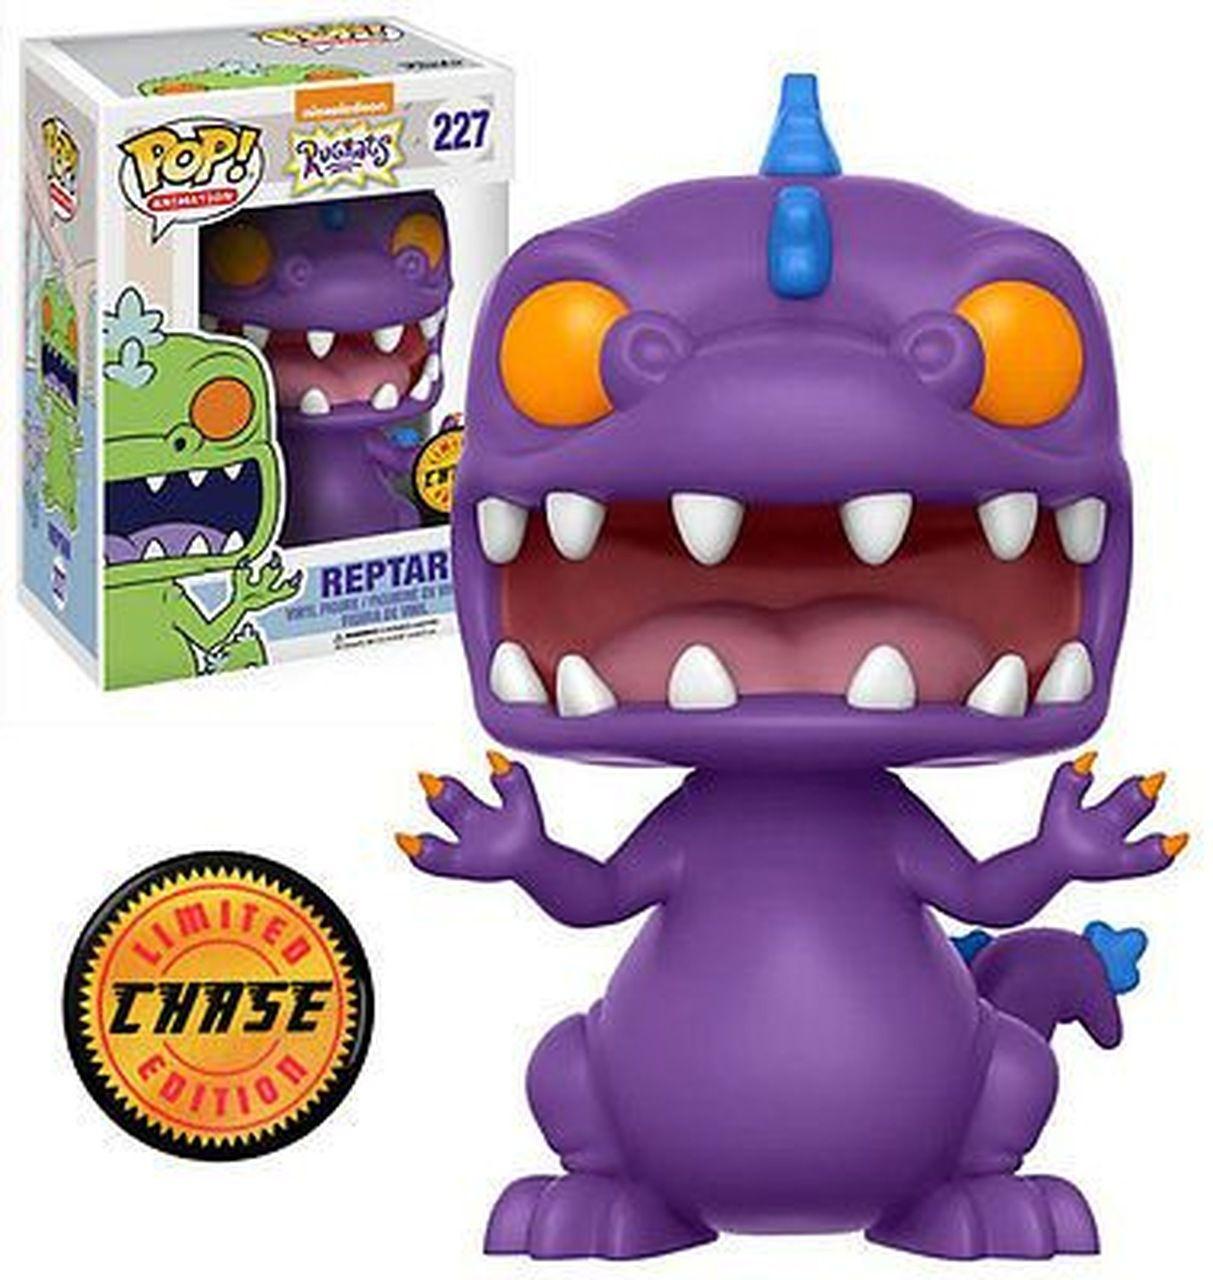 Pop! Reptar: Rugrats Os Anjinhos (Nickelodeon) Chase #227 - Funko